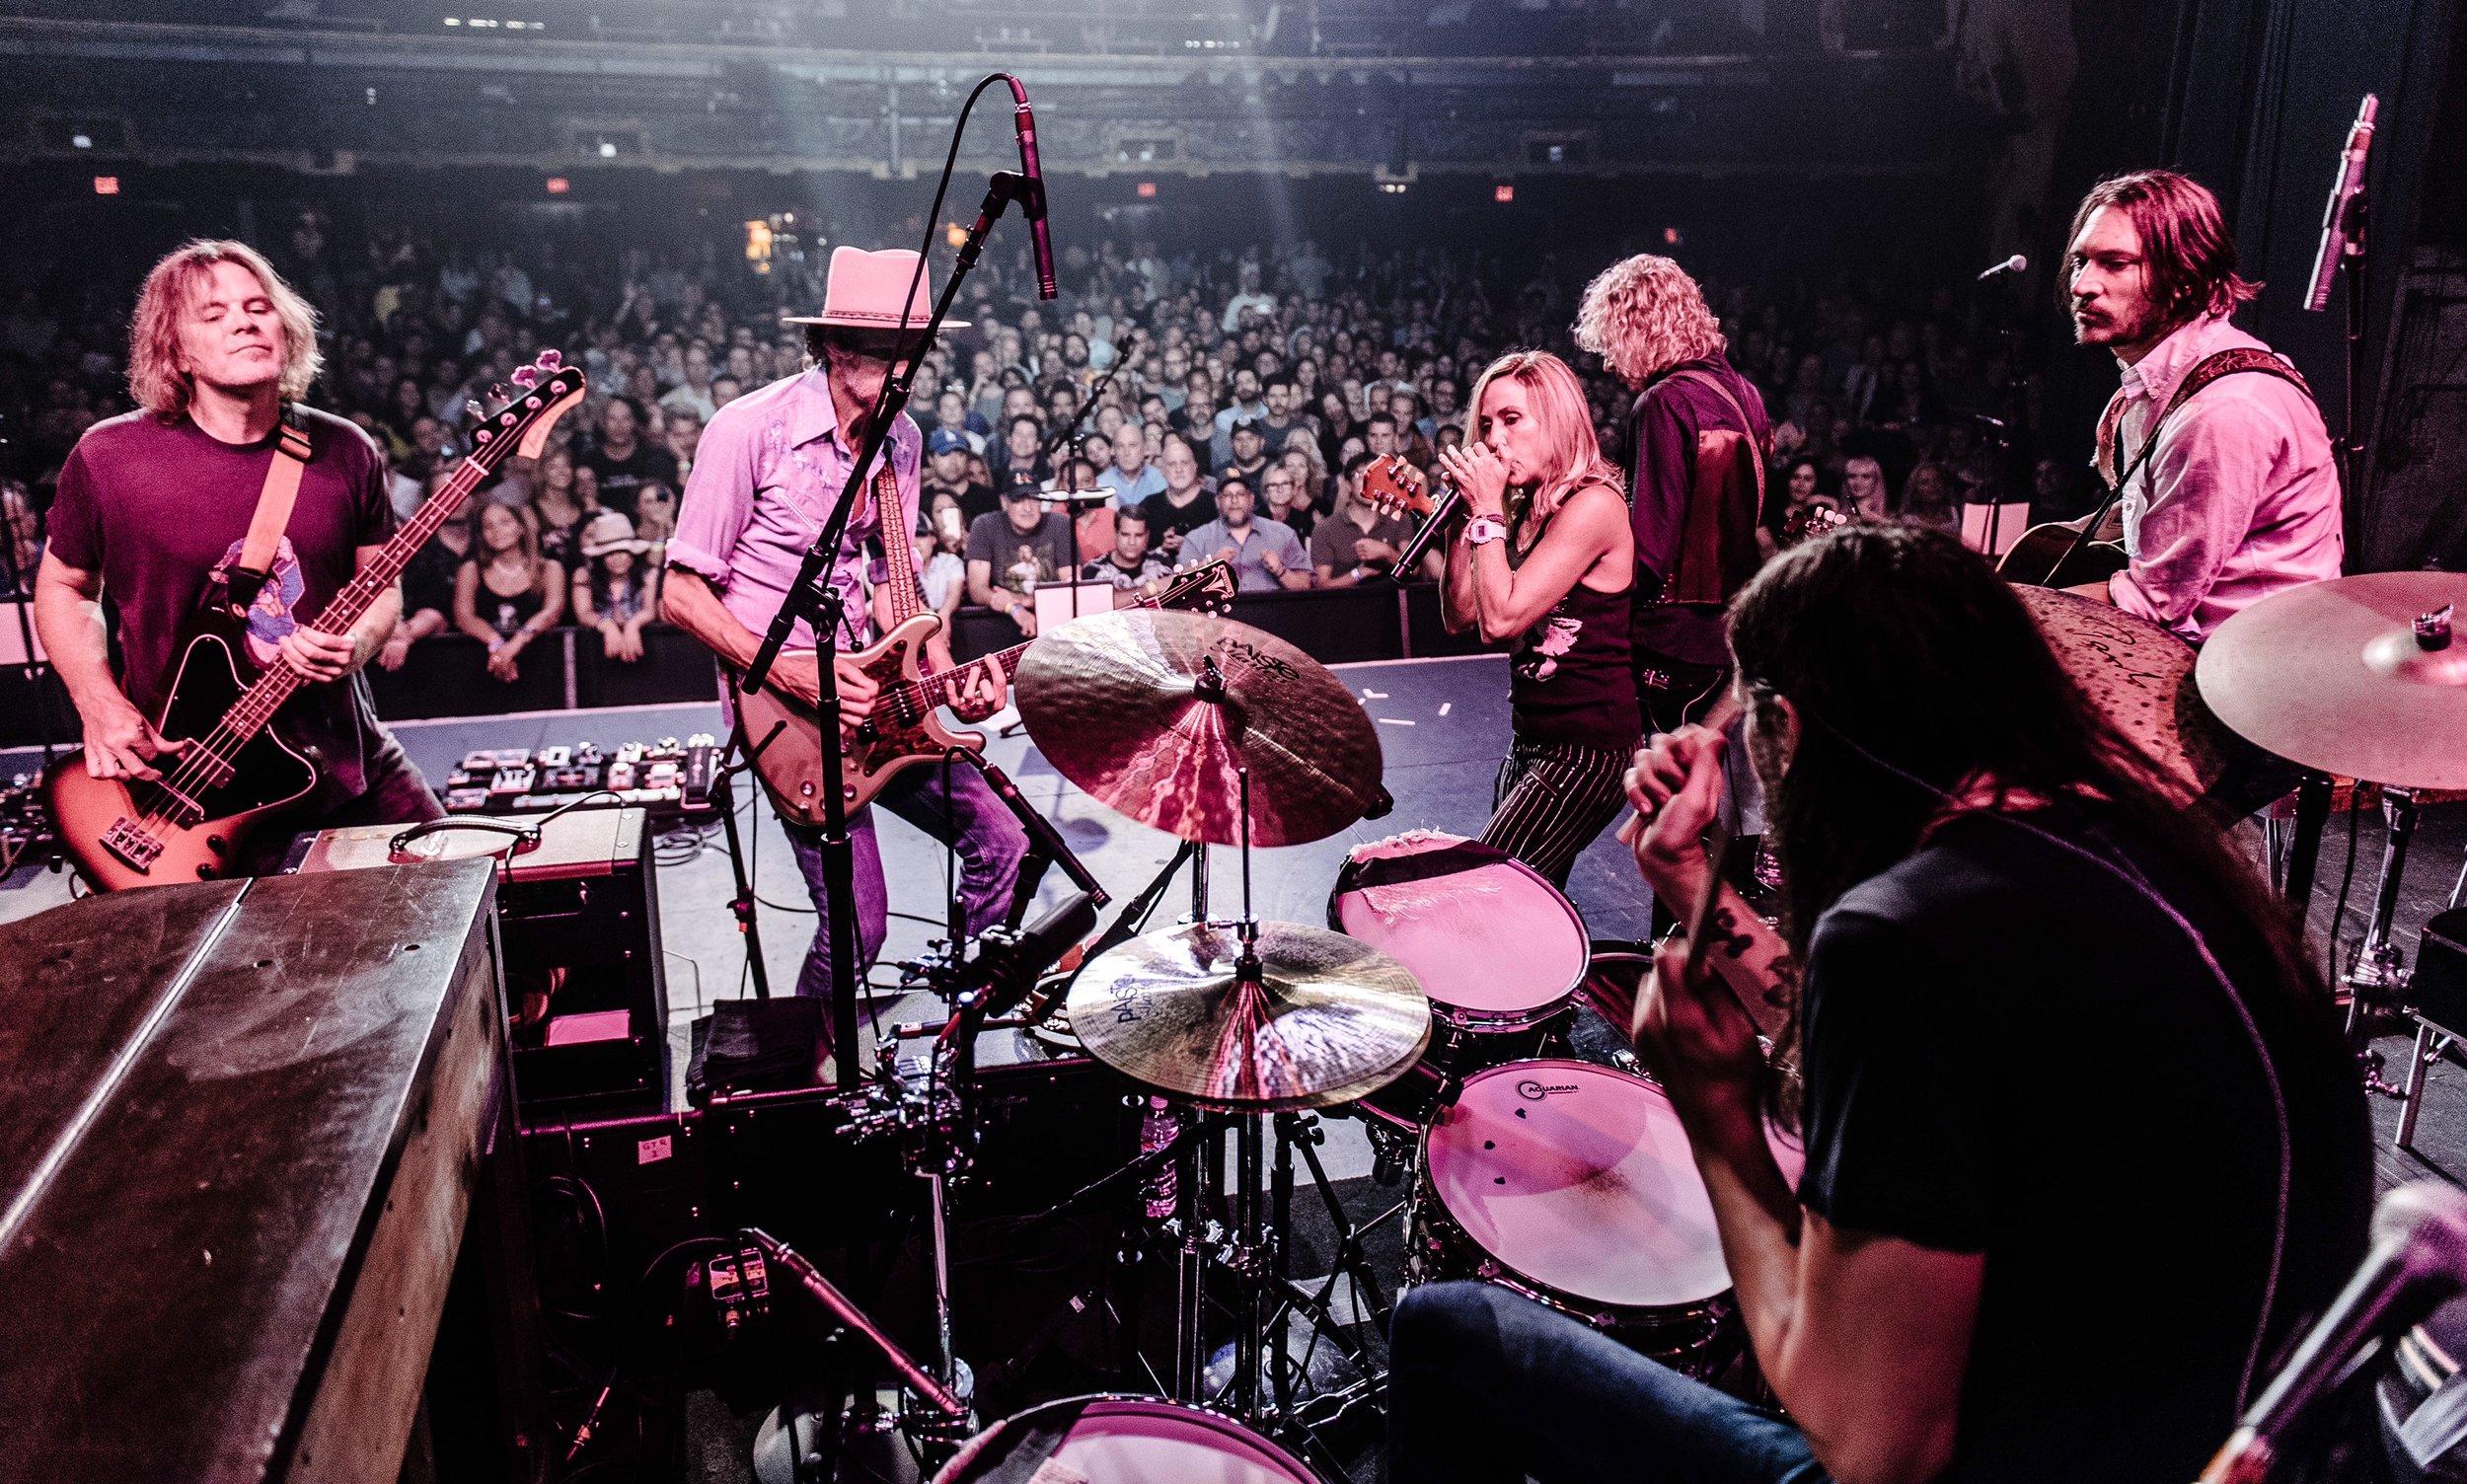 Photo: Joey Martinez